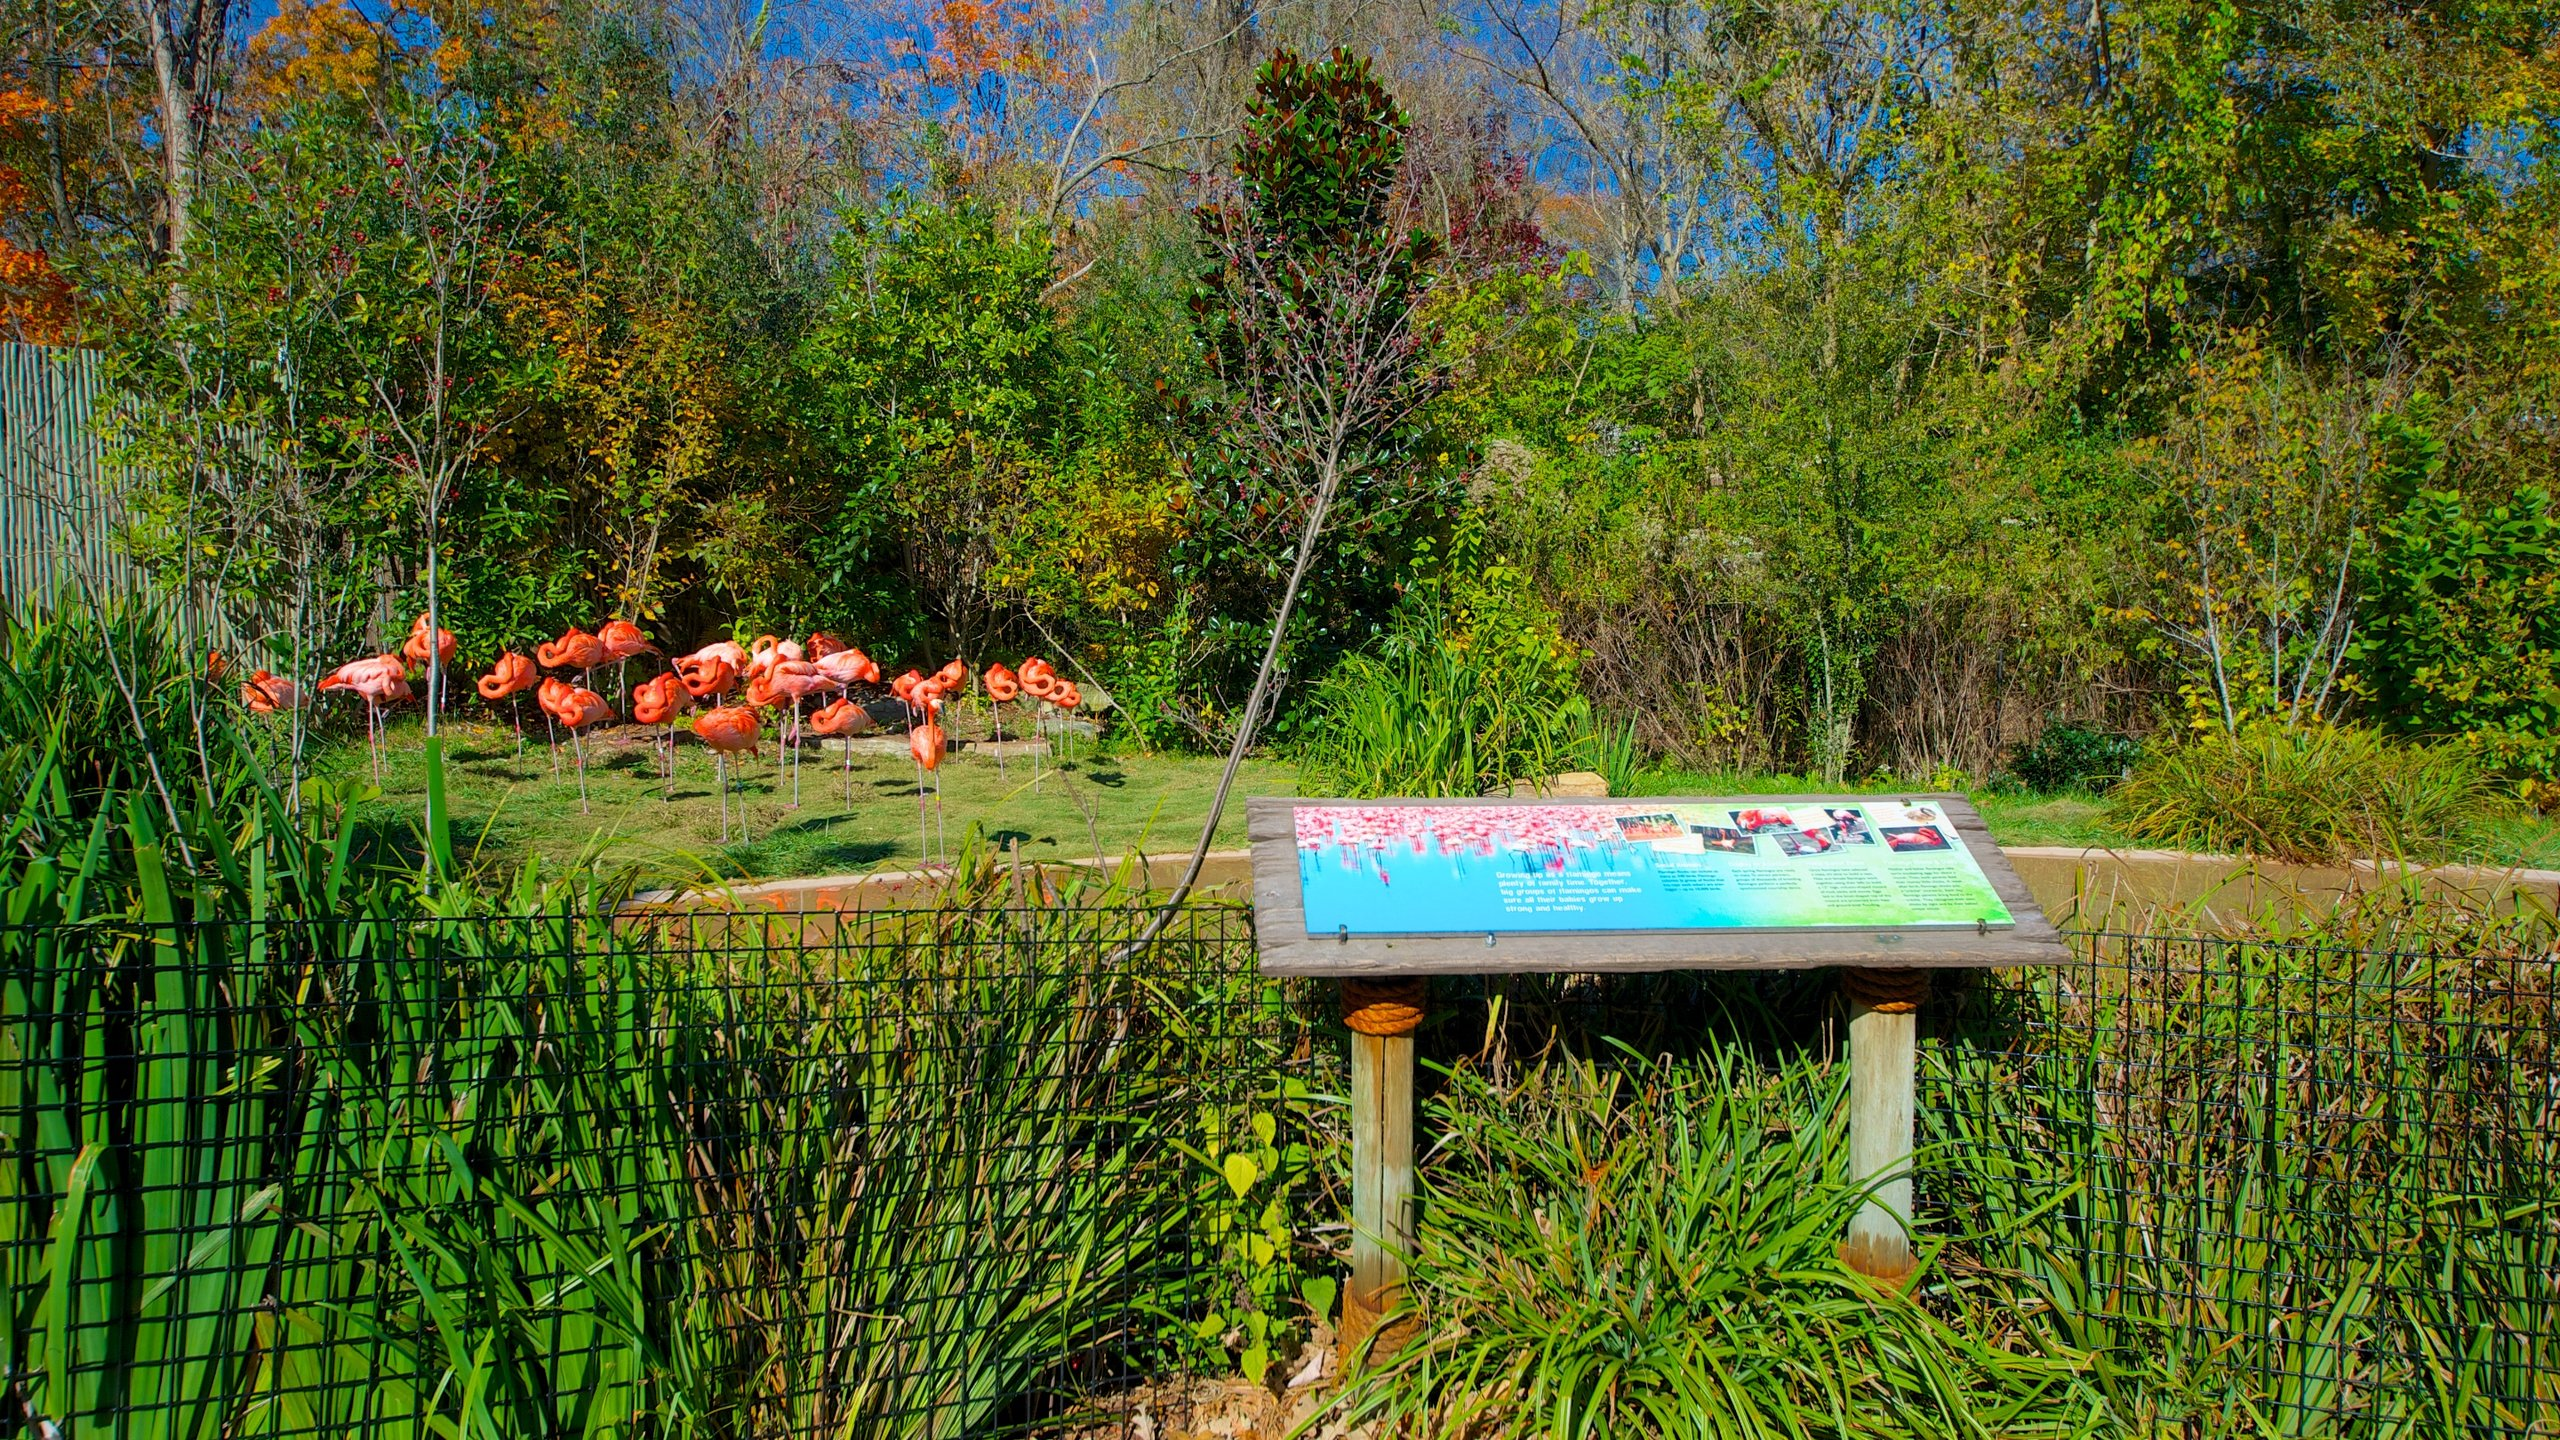 Nashville Zoo, Nashville, Tennessee, United States of America